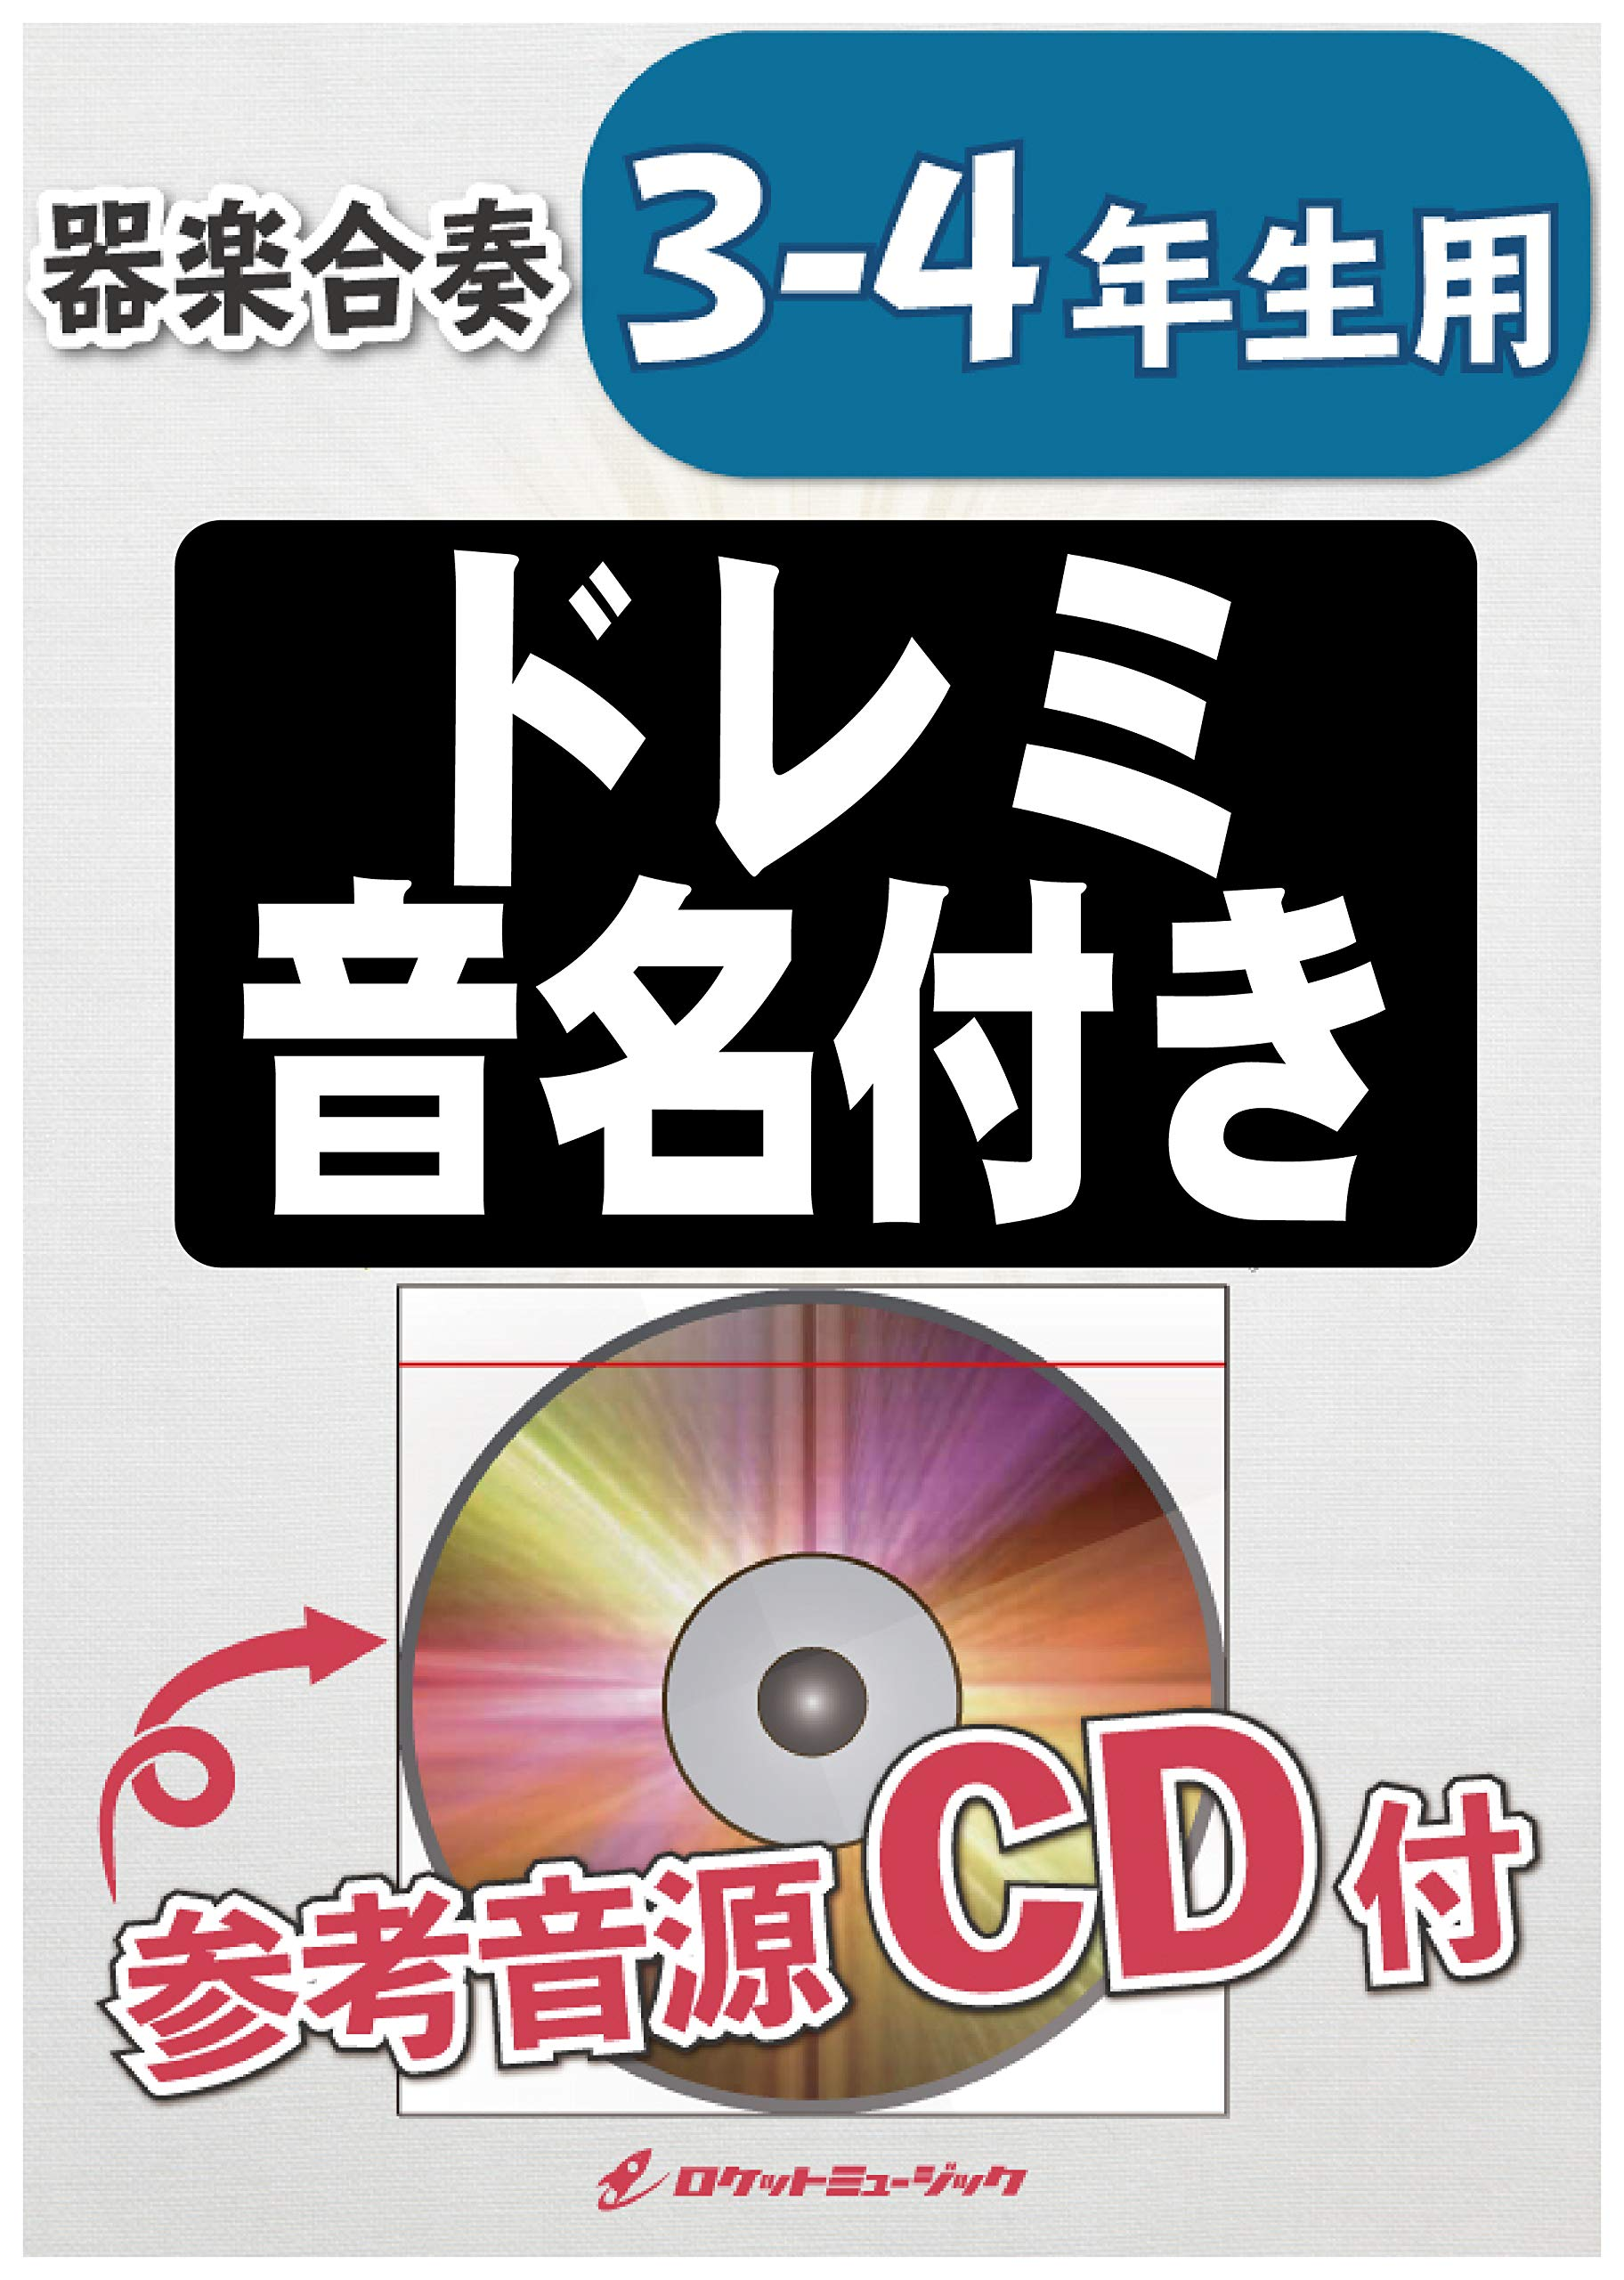 パプリカ/Foorin(comp.米津玄師)【3,4年生用、参考音源CD付